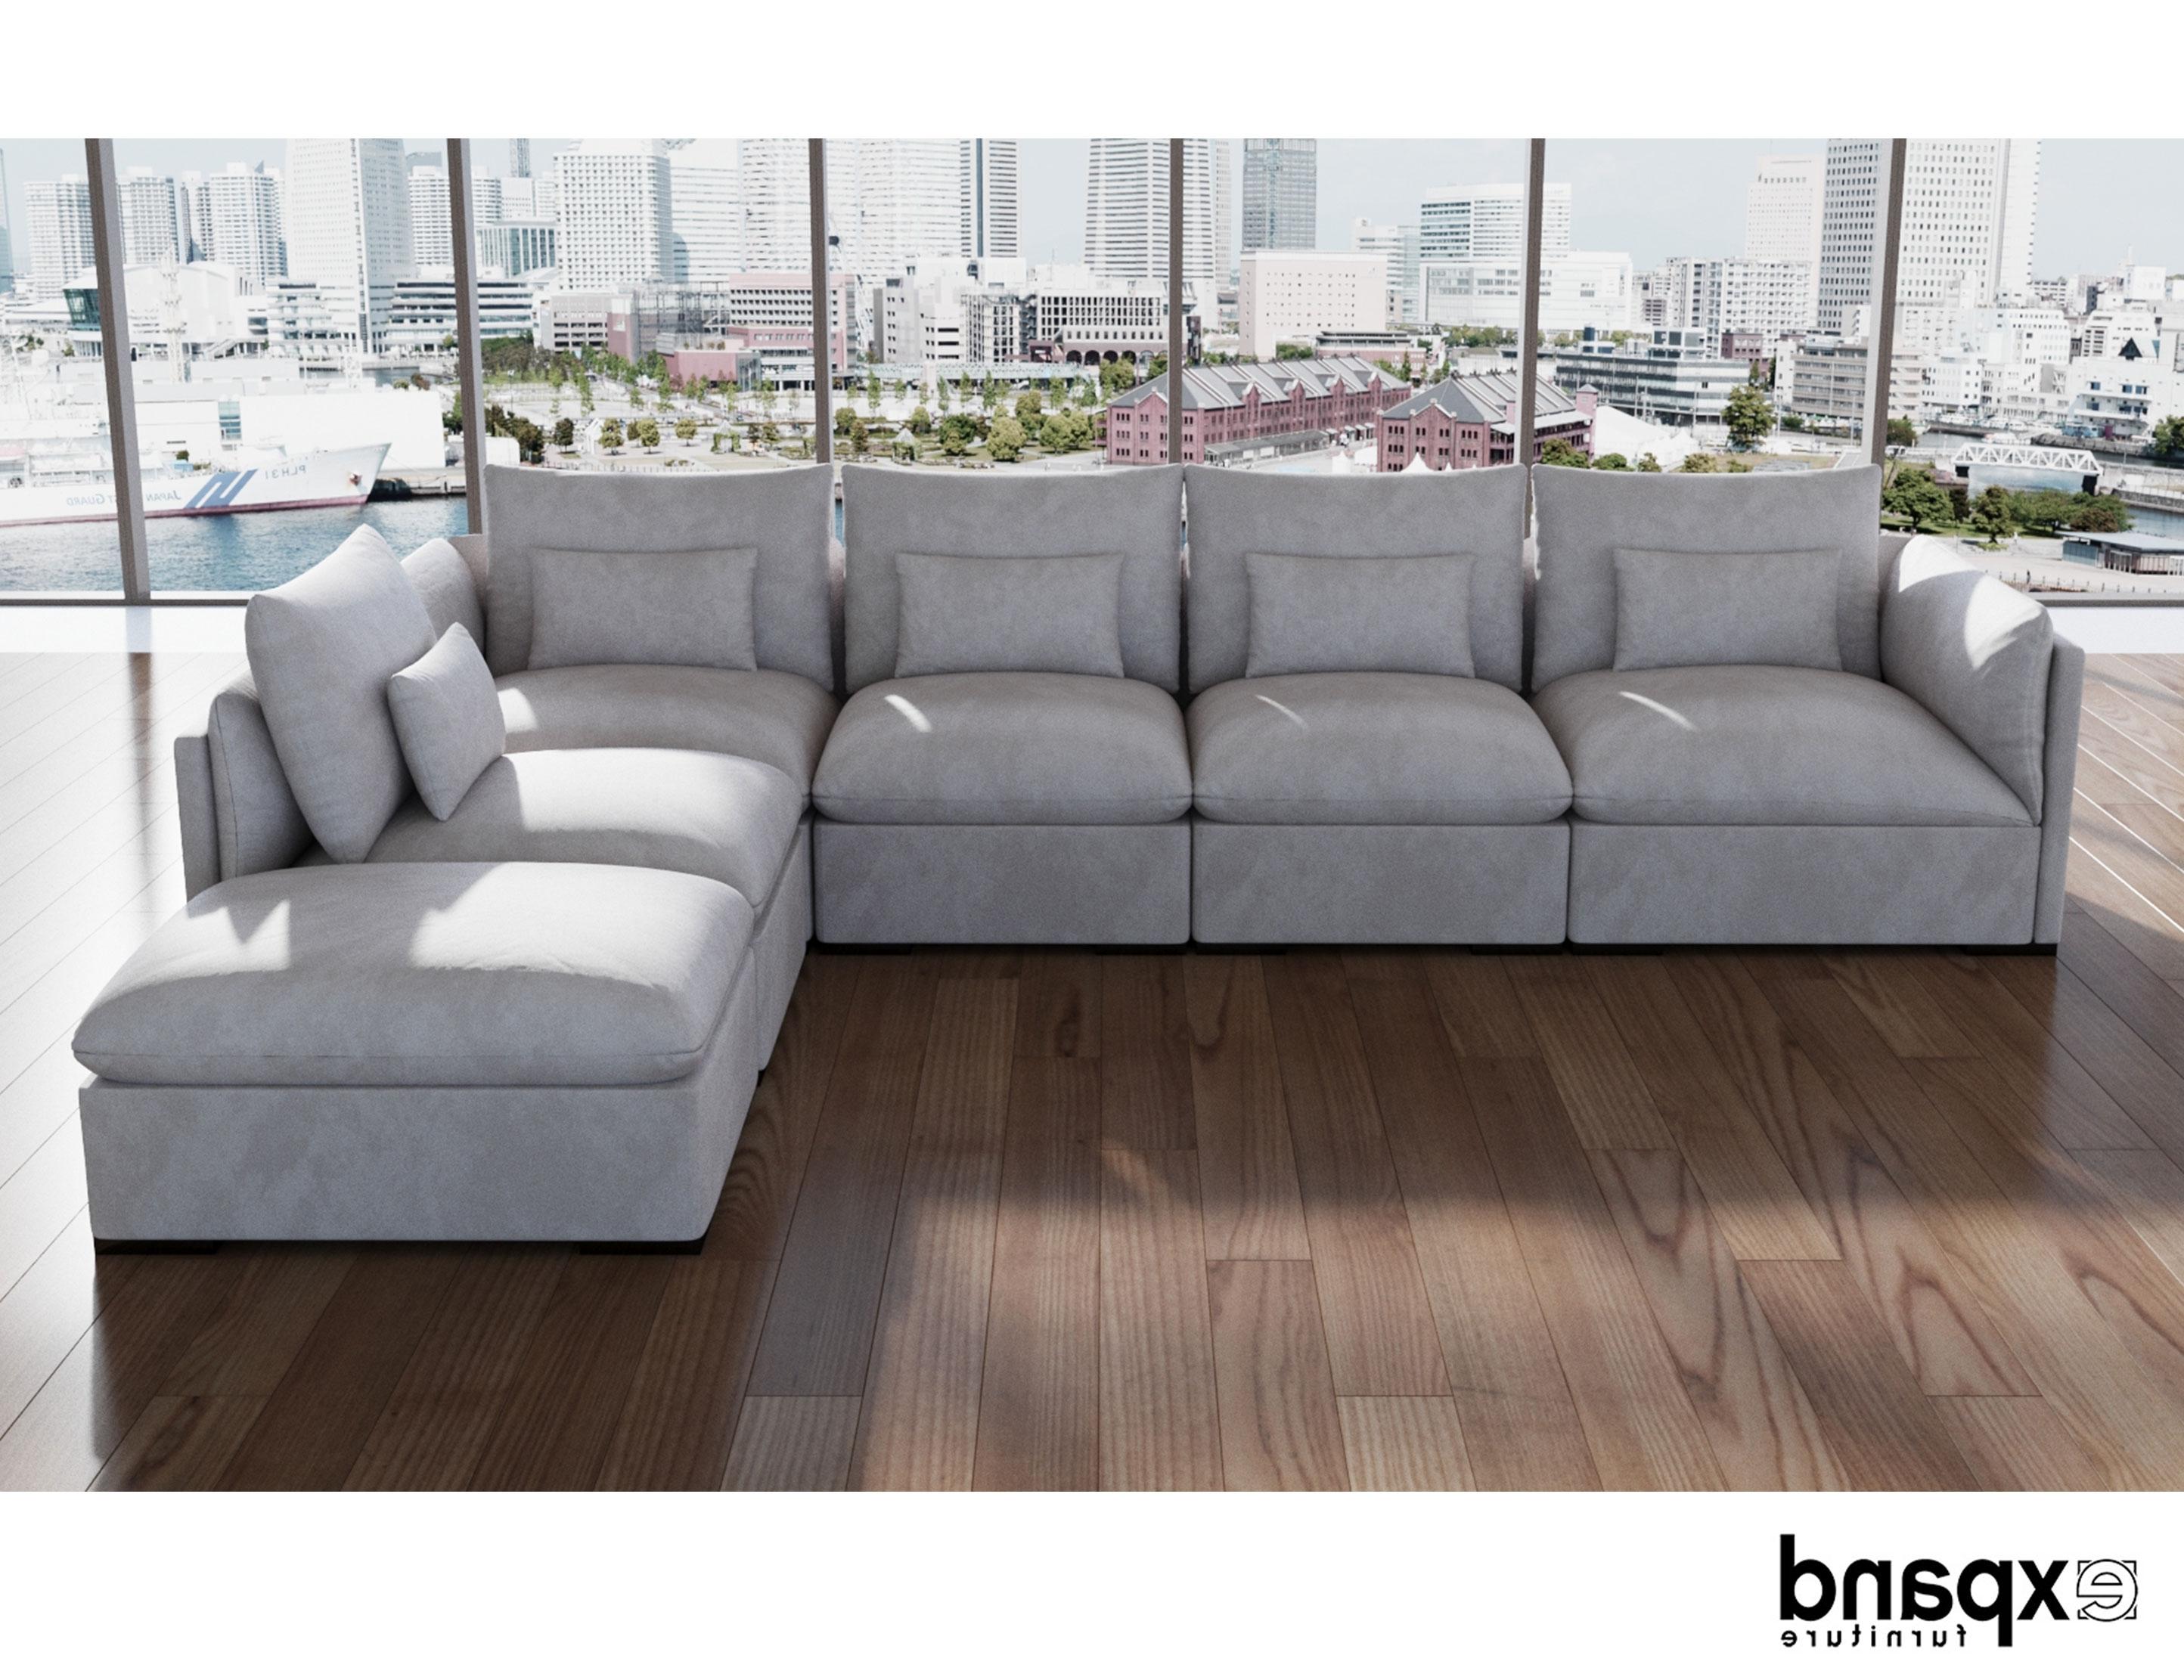 Adagio: Single Luxury Feather Sofa Module (View 11 of 20)